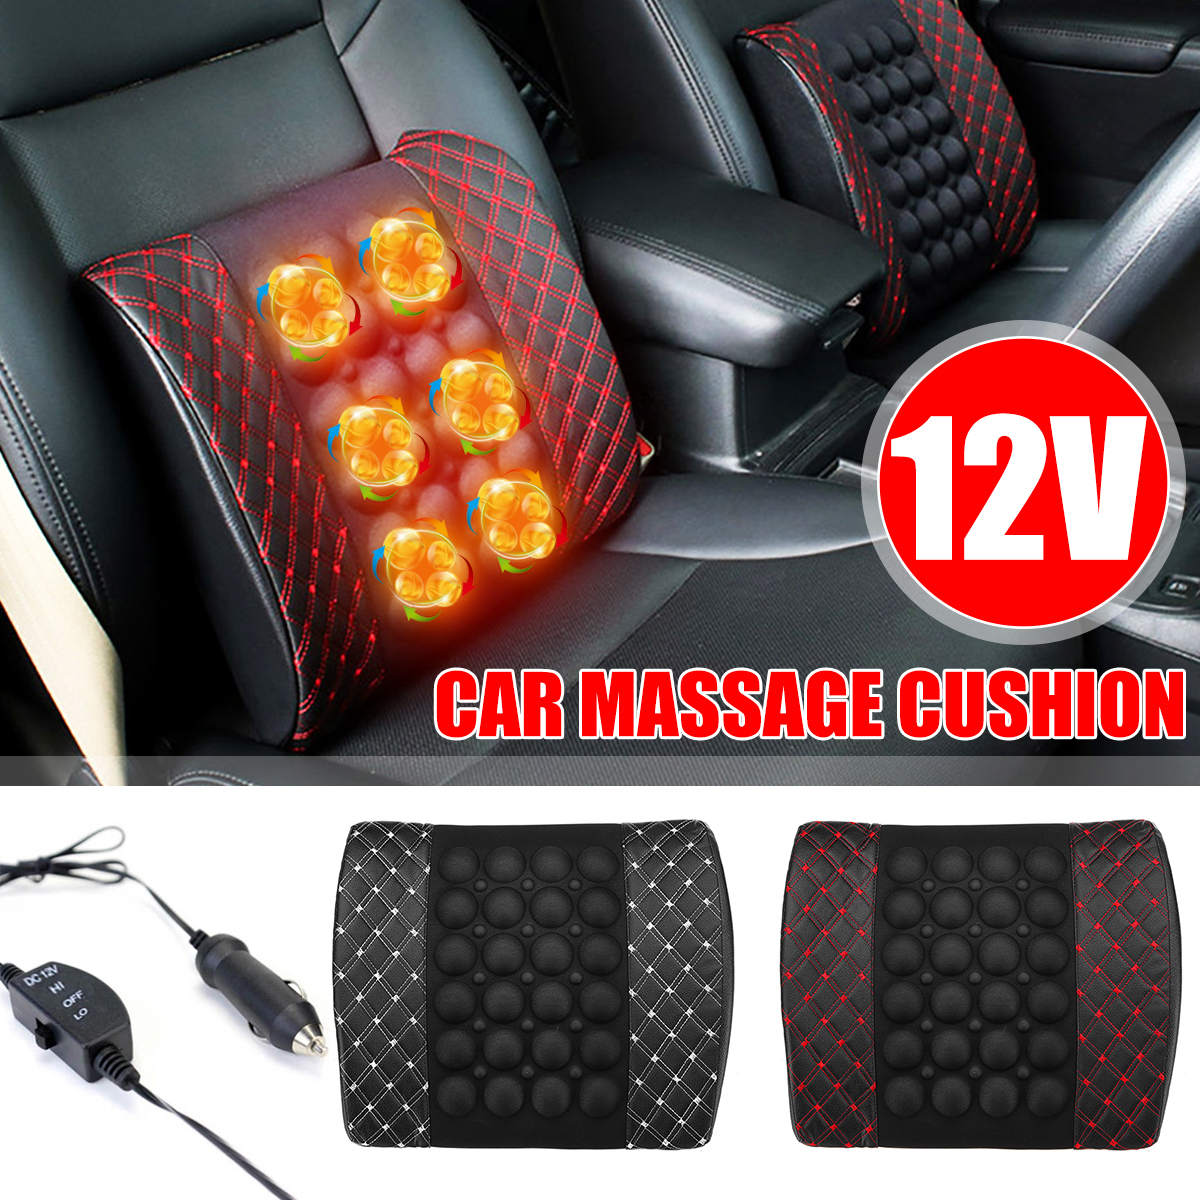 12V Car Massage Lumbar Cushion Car Electric Massage Cushion lumbar Massage Car Seat Back Cushion Waist support